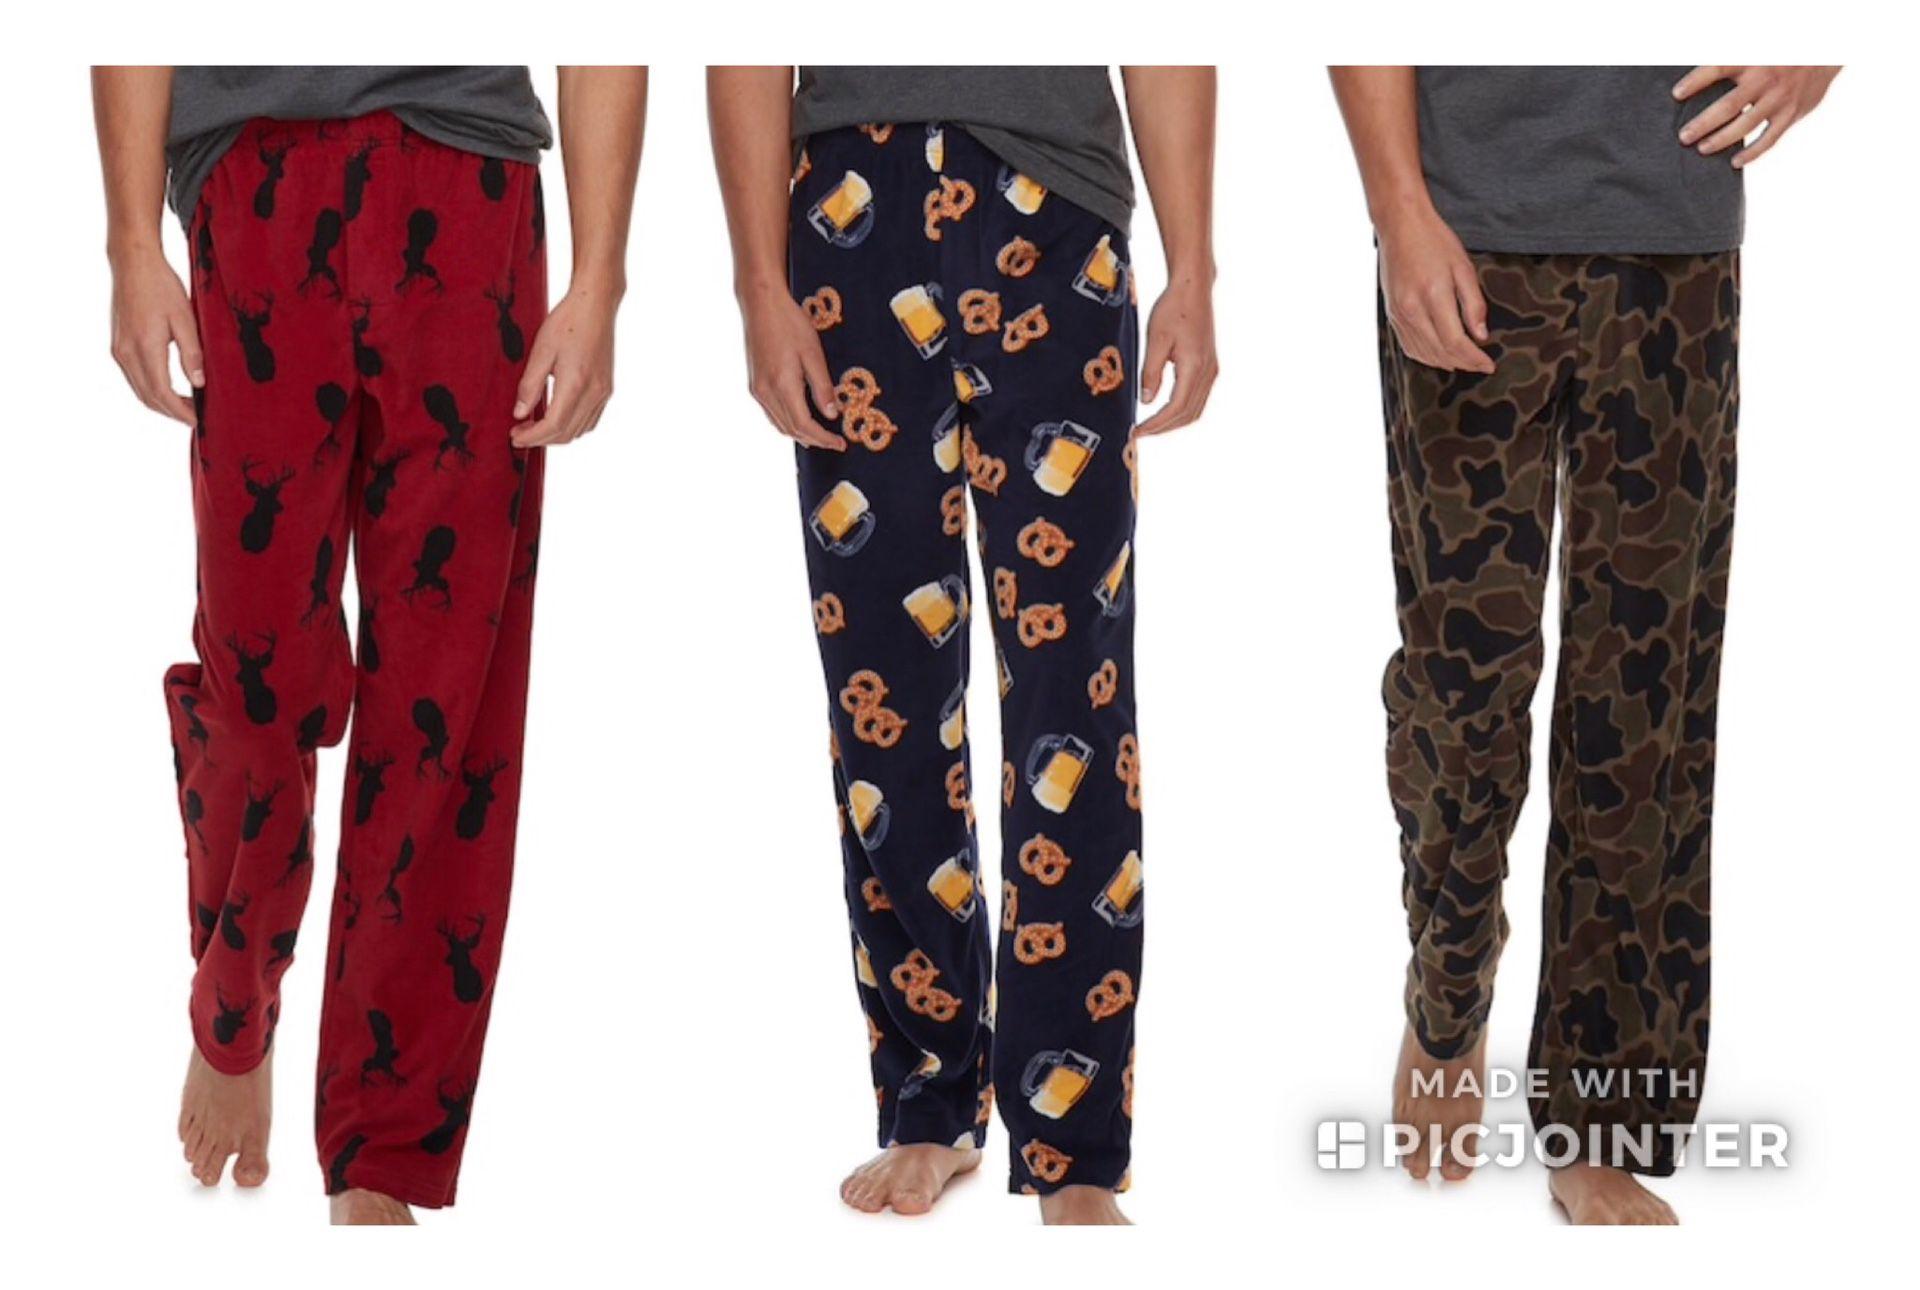 New Men's Patterned Microfleece Pants Size M L XL